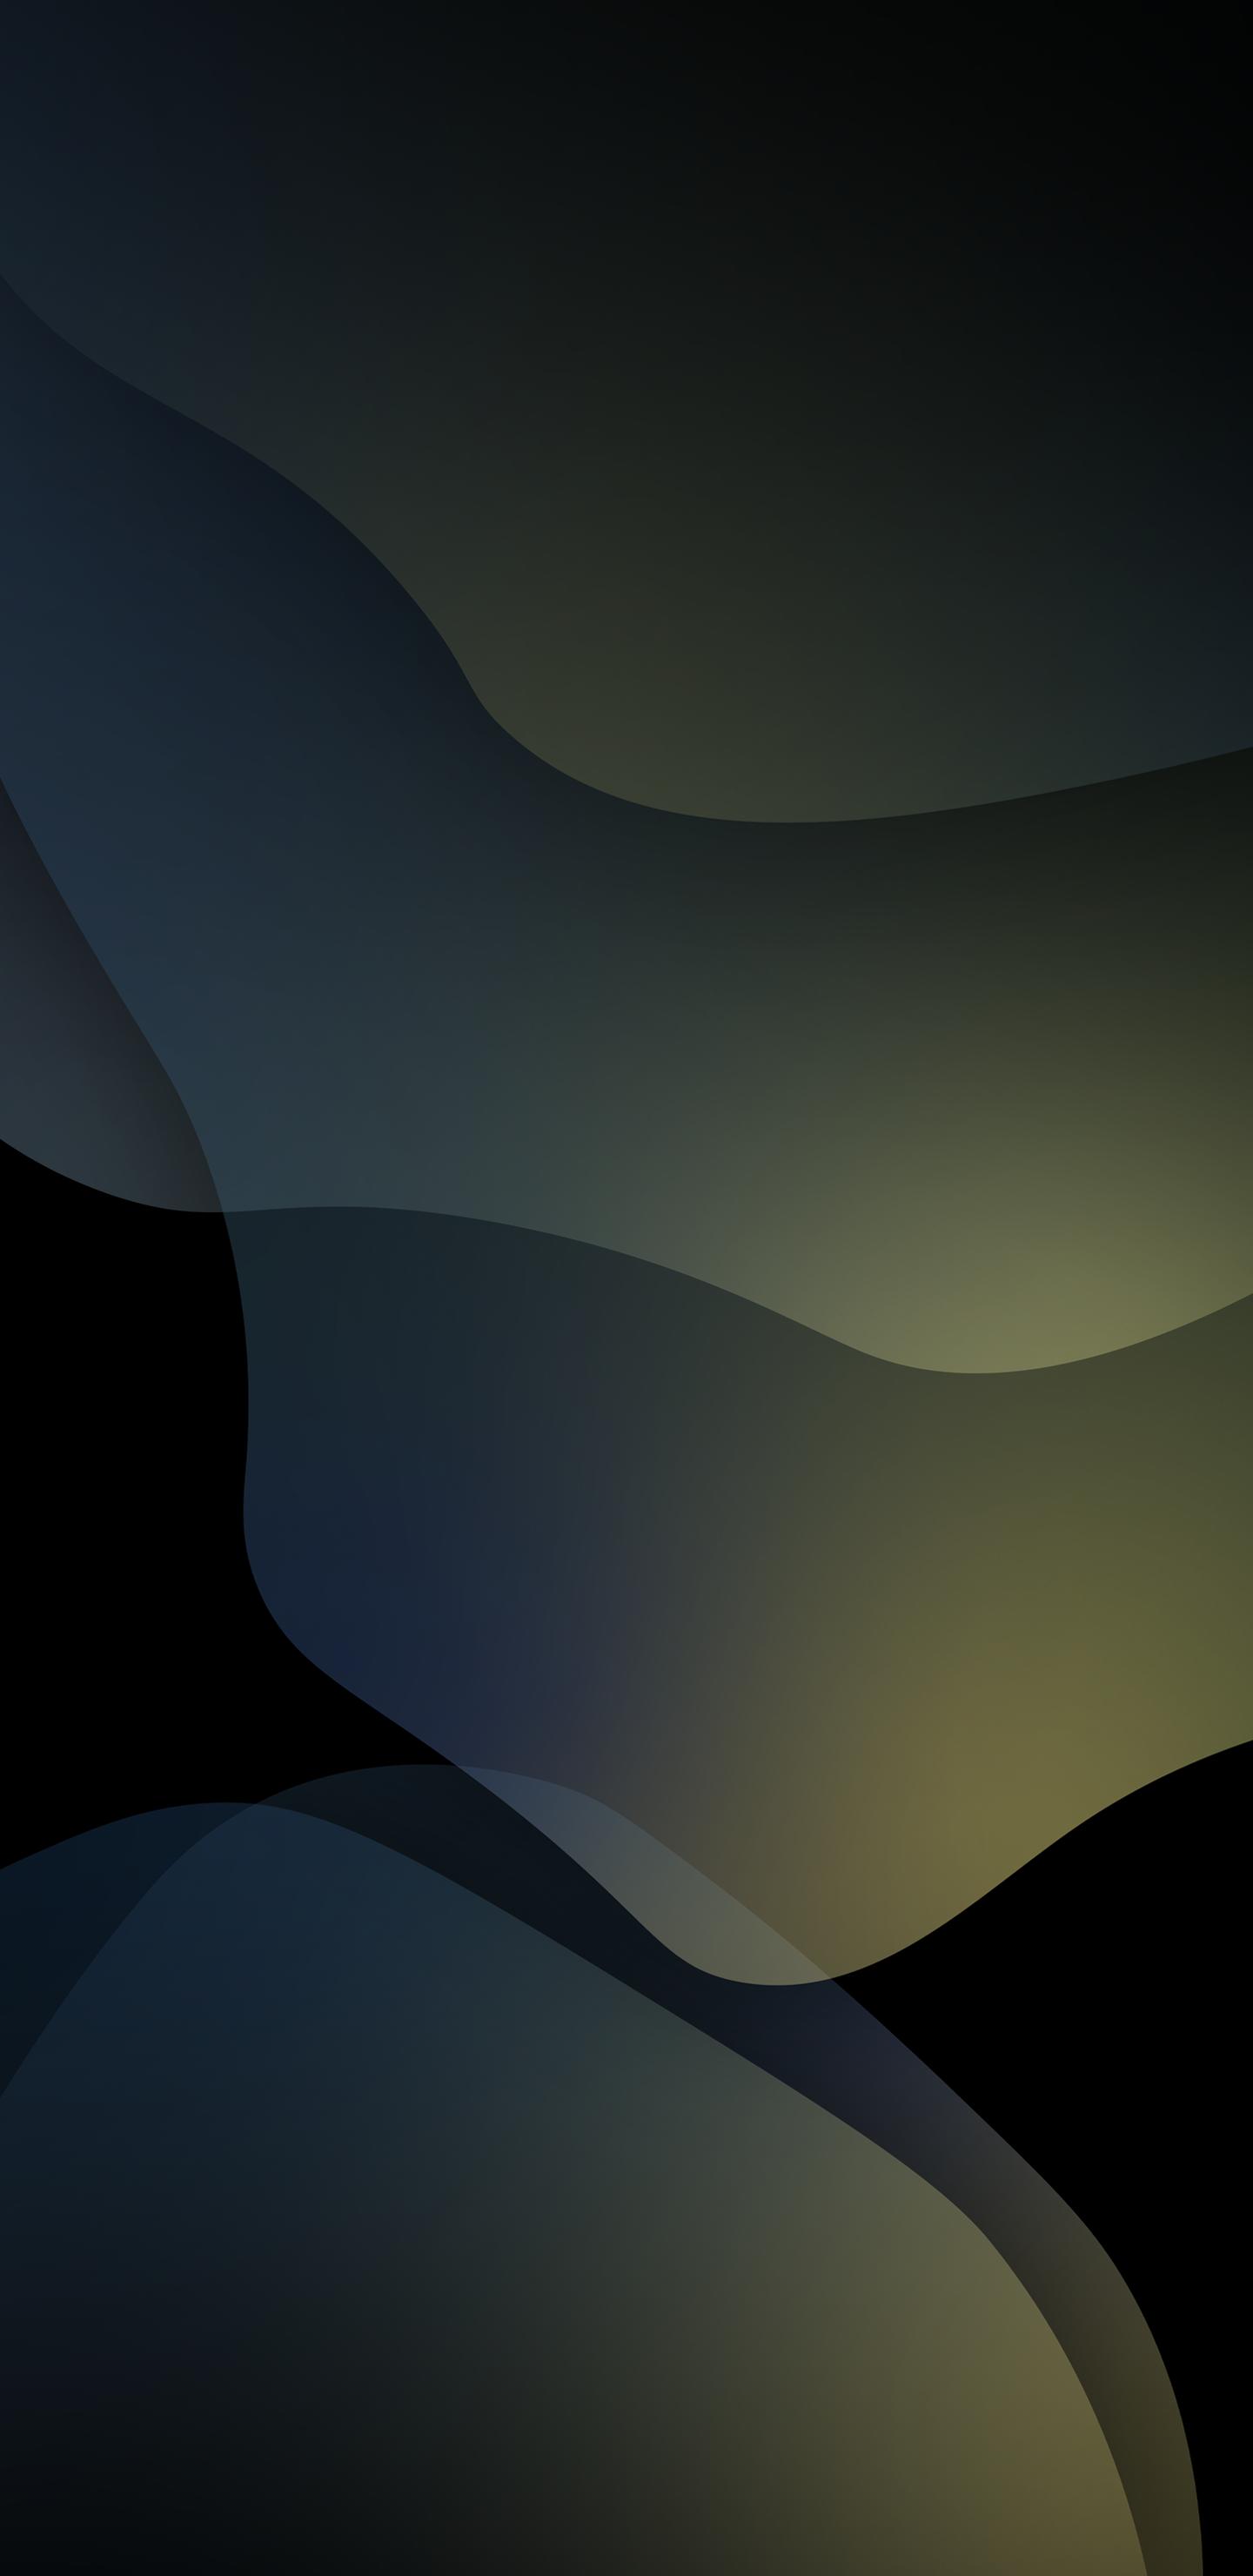 iOS 13 True Dark Wallpaper   HoangEdison ios13wallpaper iOS 13 1440x2960